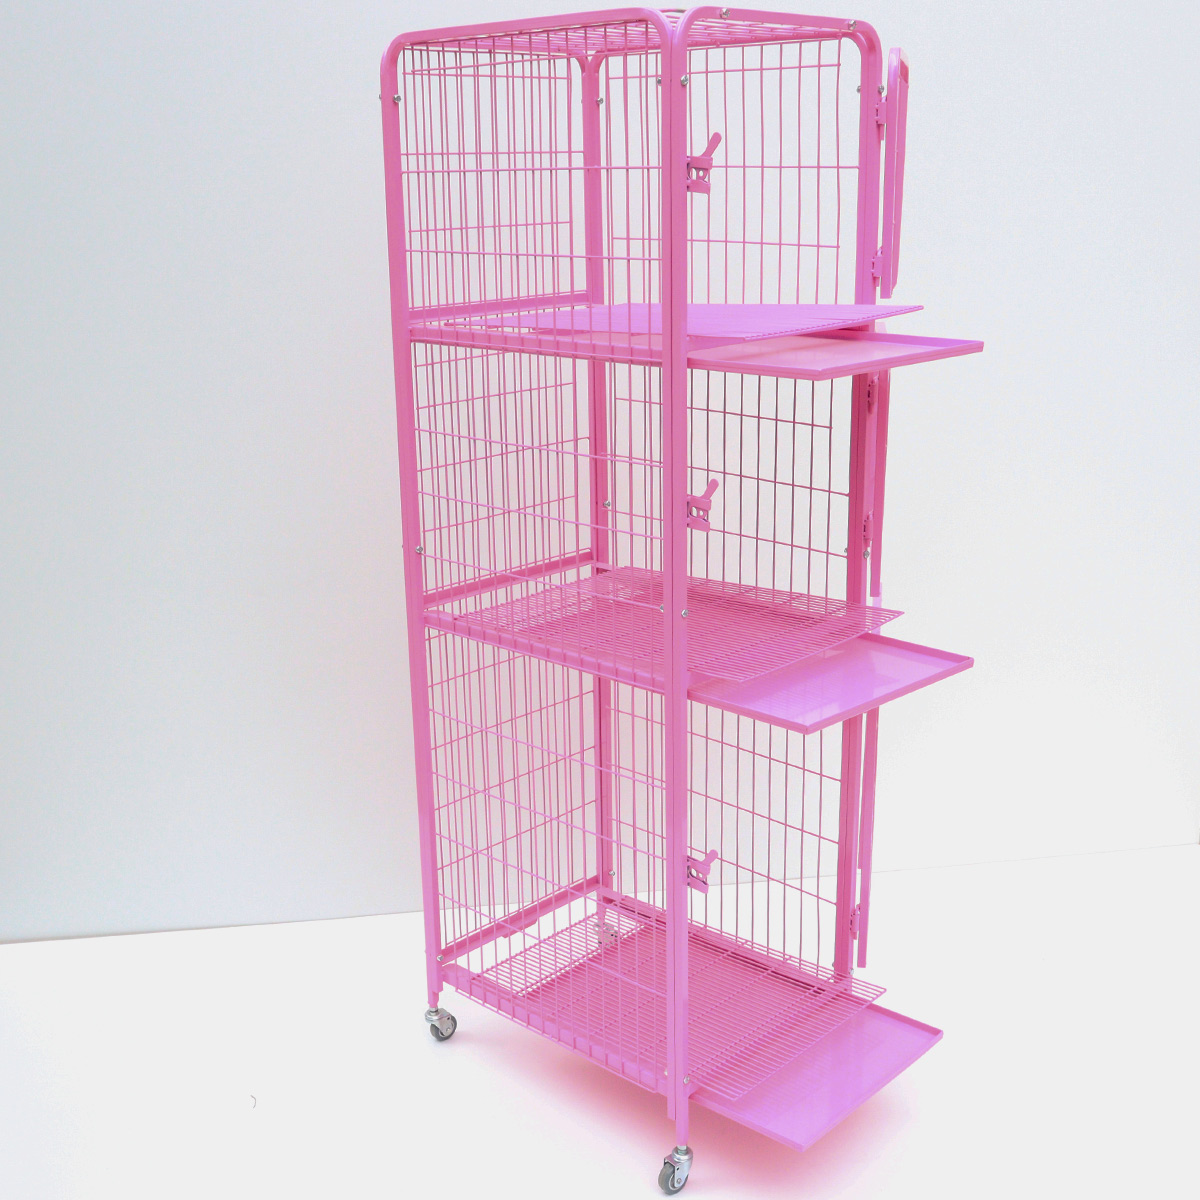 Gaiola canil Cães E Gatos 3 lugares - cor de rosa